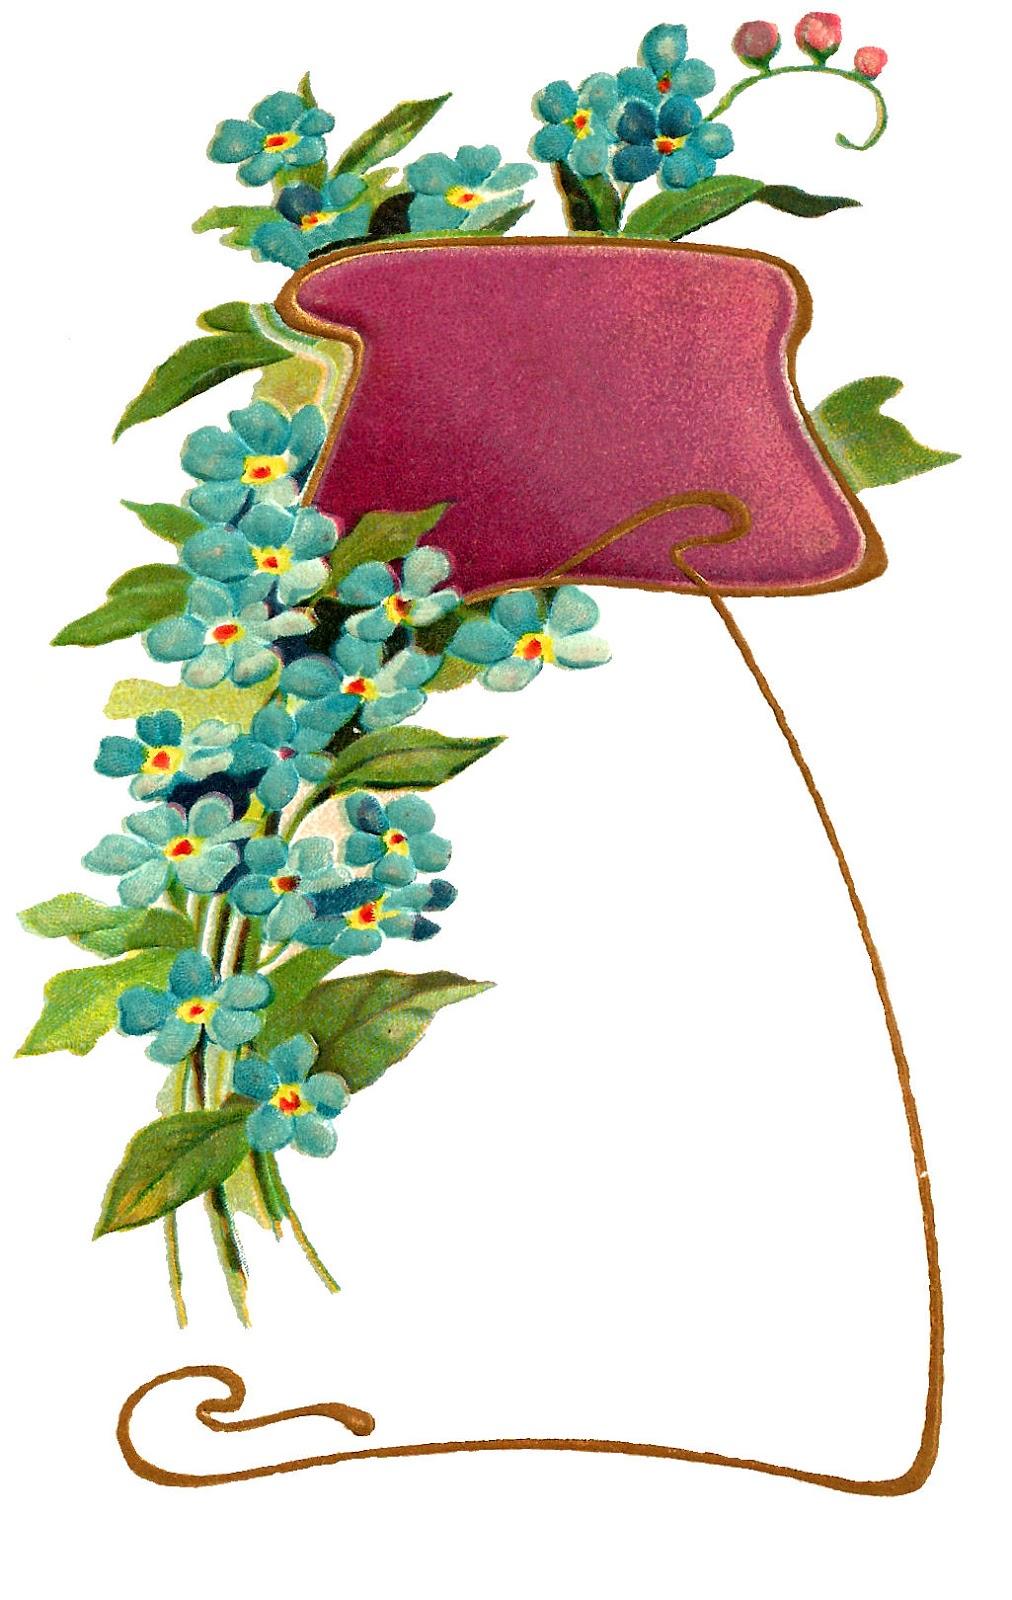 1012x1600 The Graphics Monarch Botanical Art Flower Digital Frame